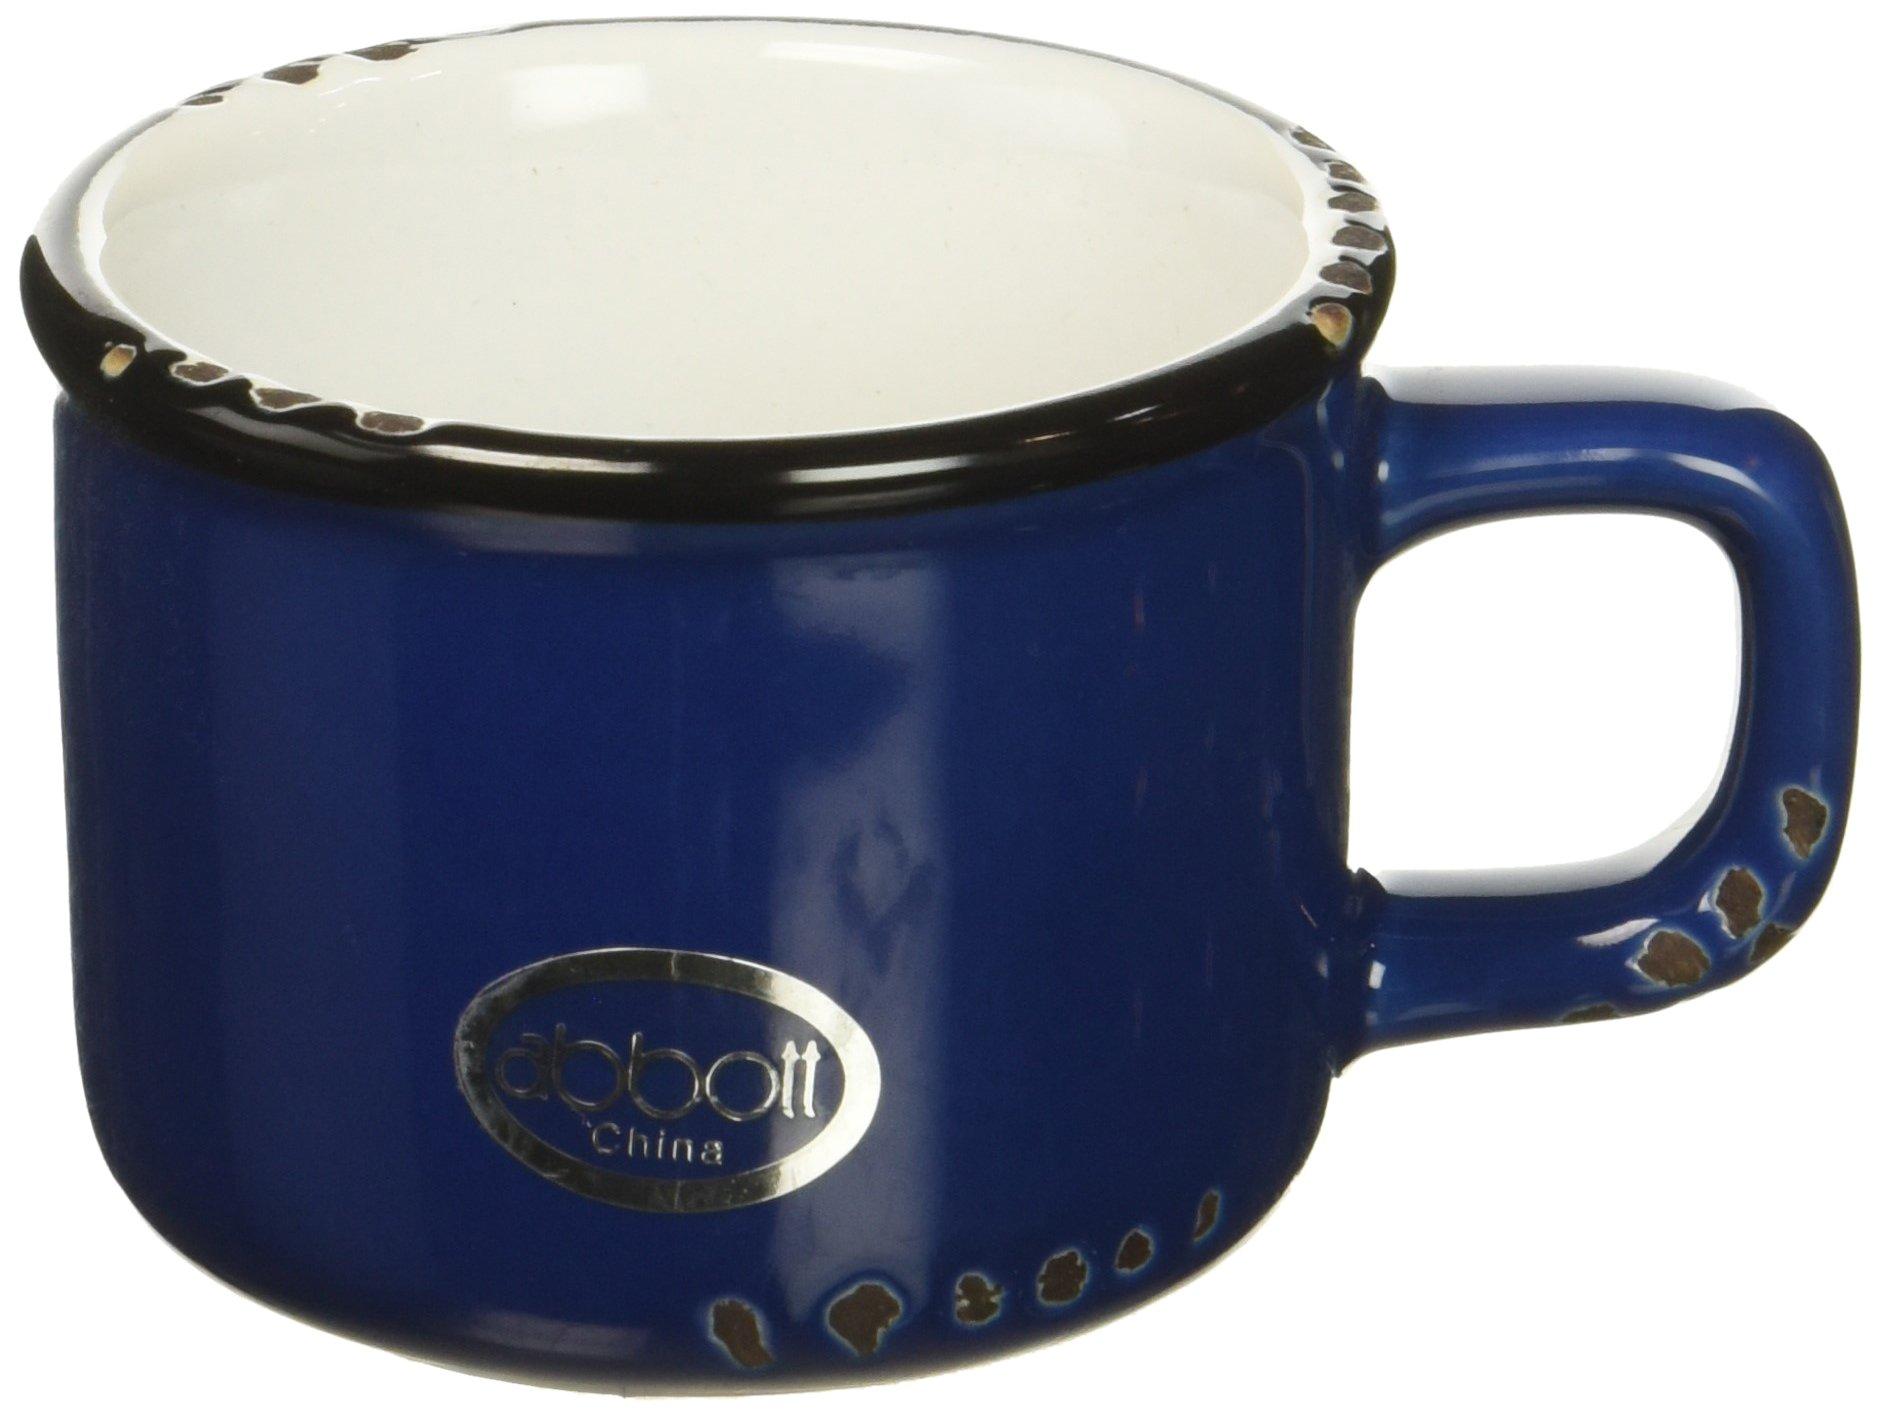 Abbott Collection Enamel Look Stoneware Espresso Cup, Blue